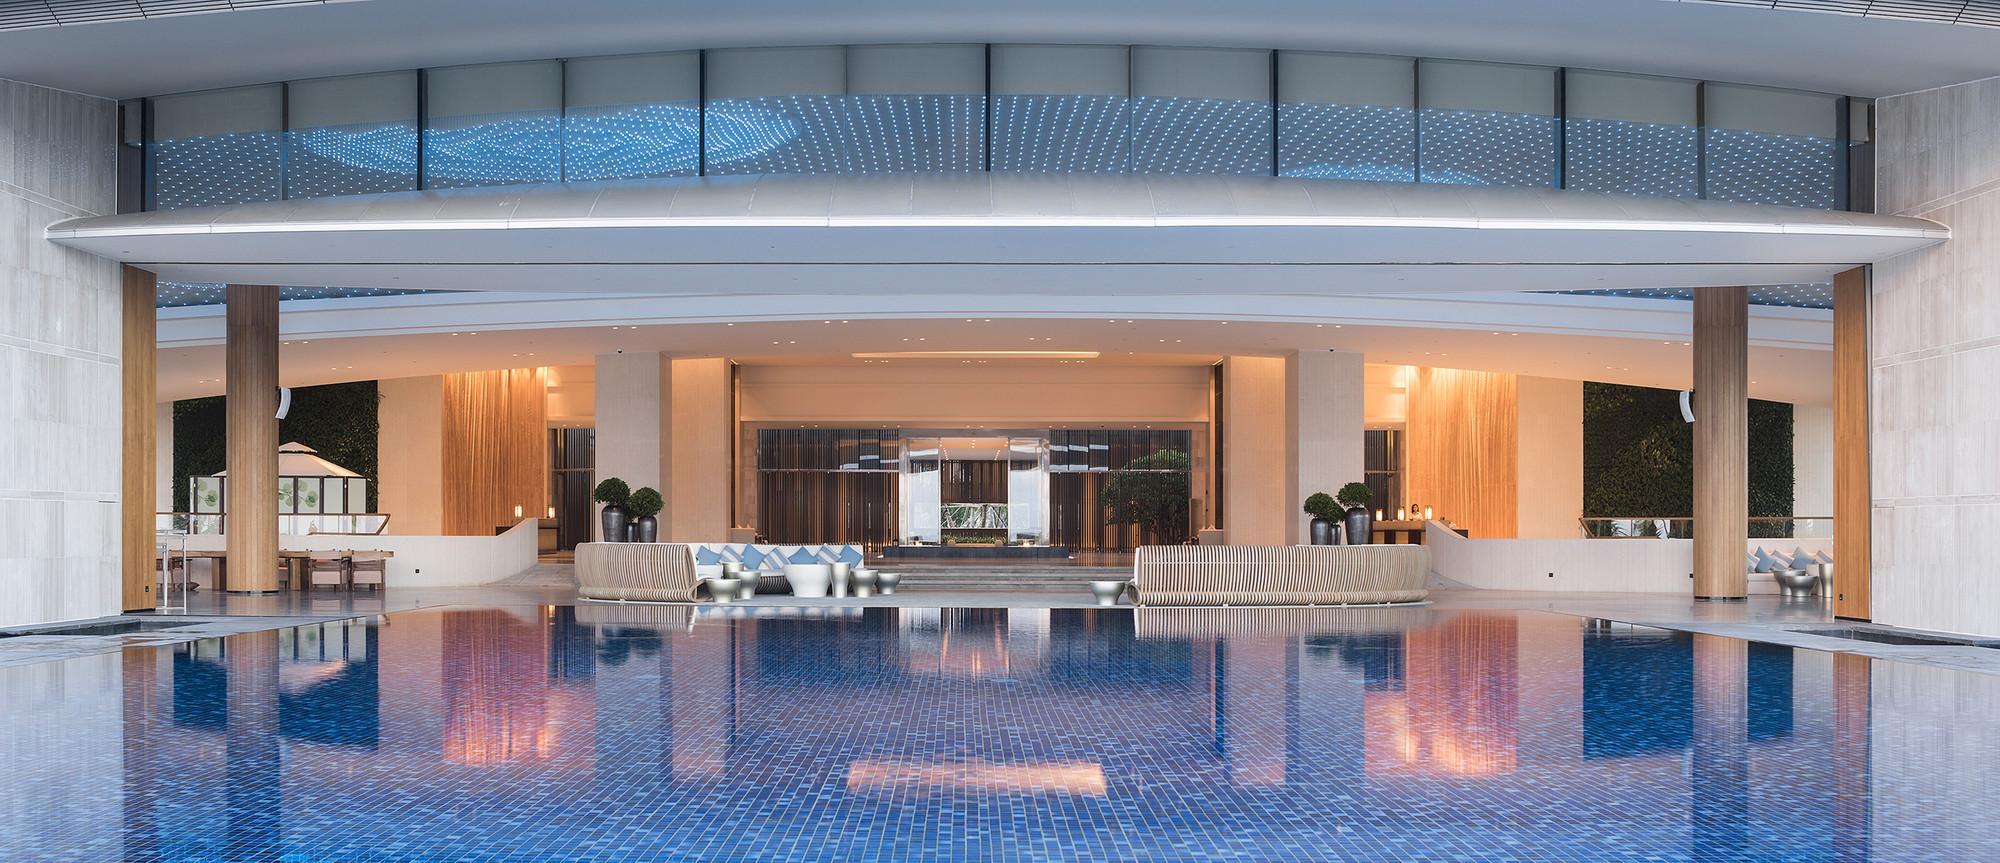 gallery of hainan blue bay westin resort hotel / gad - 7